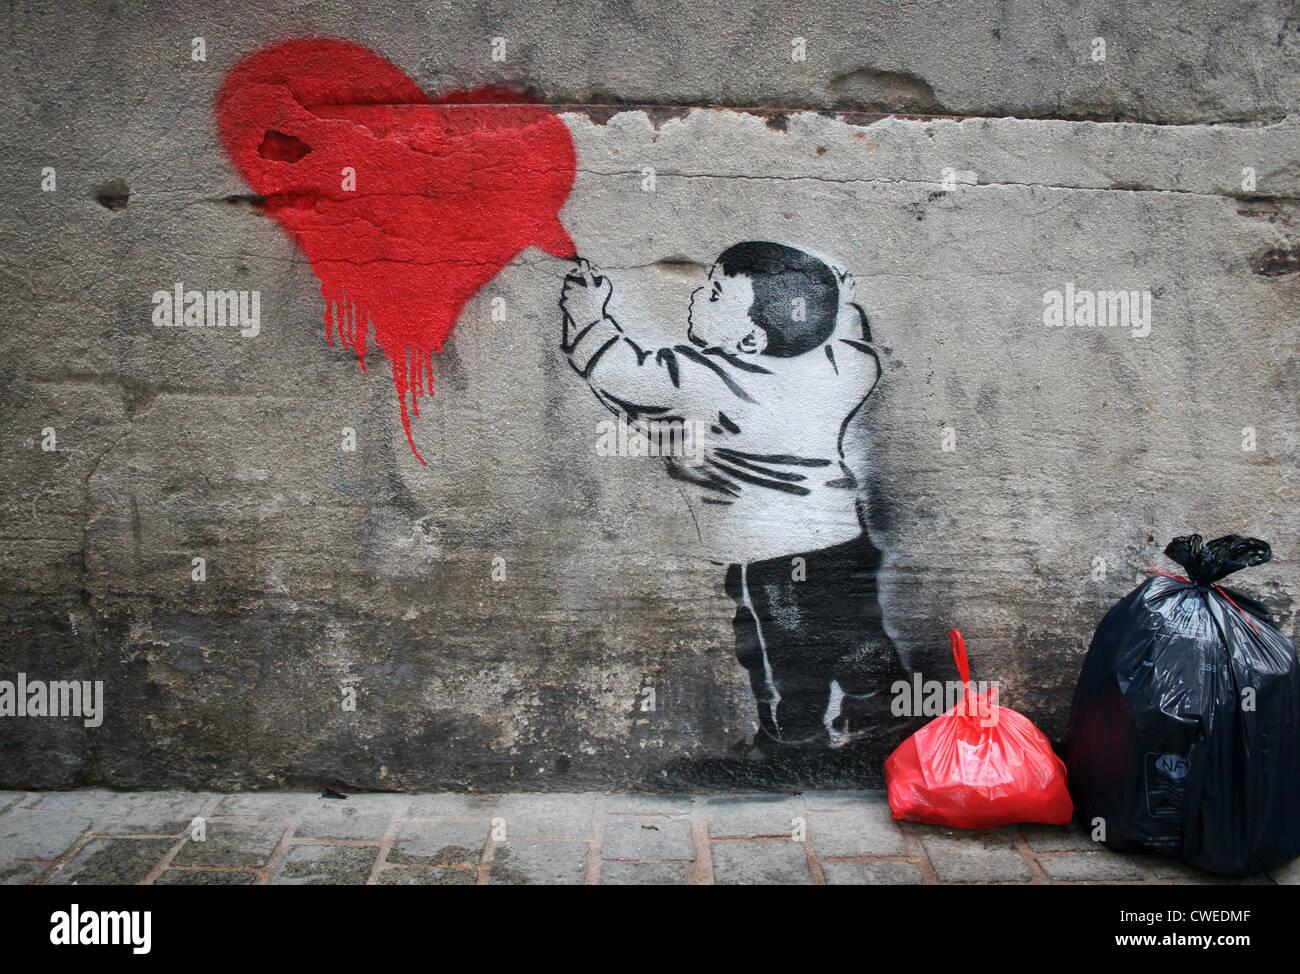 heart,spraying,graffiti,streetart Stock Photo